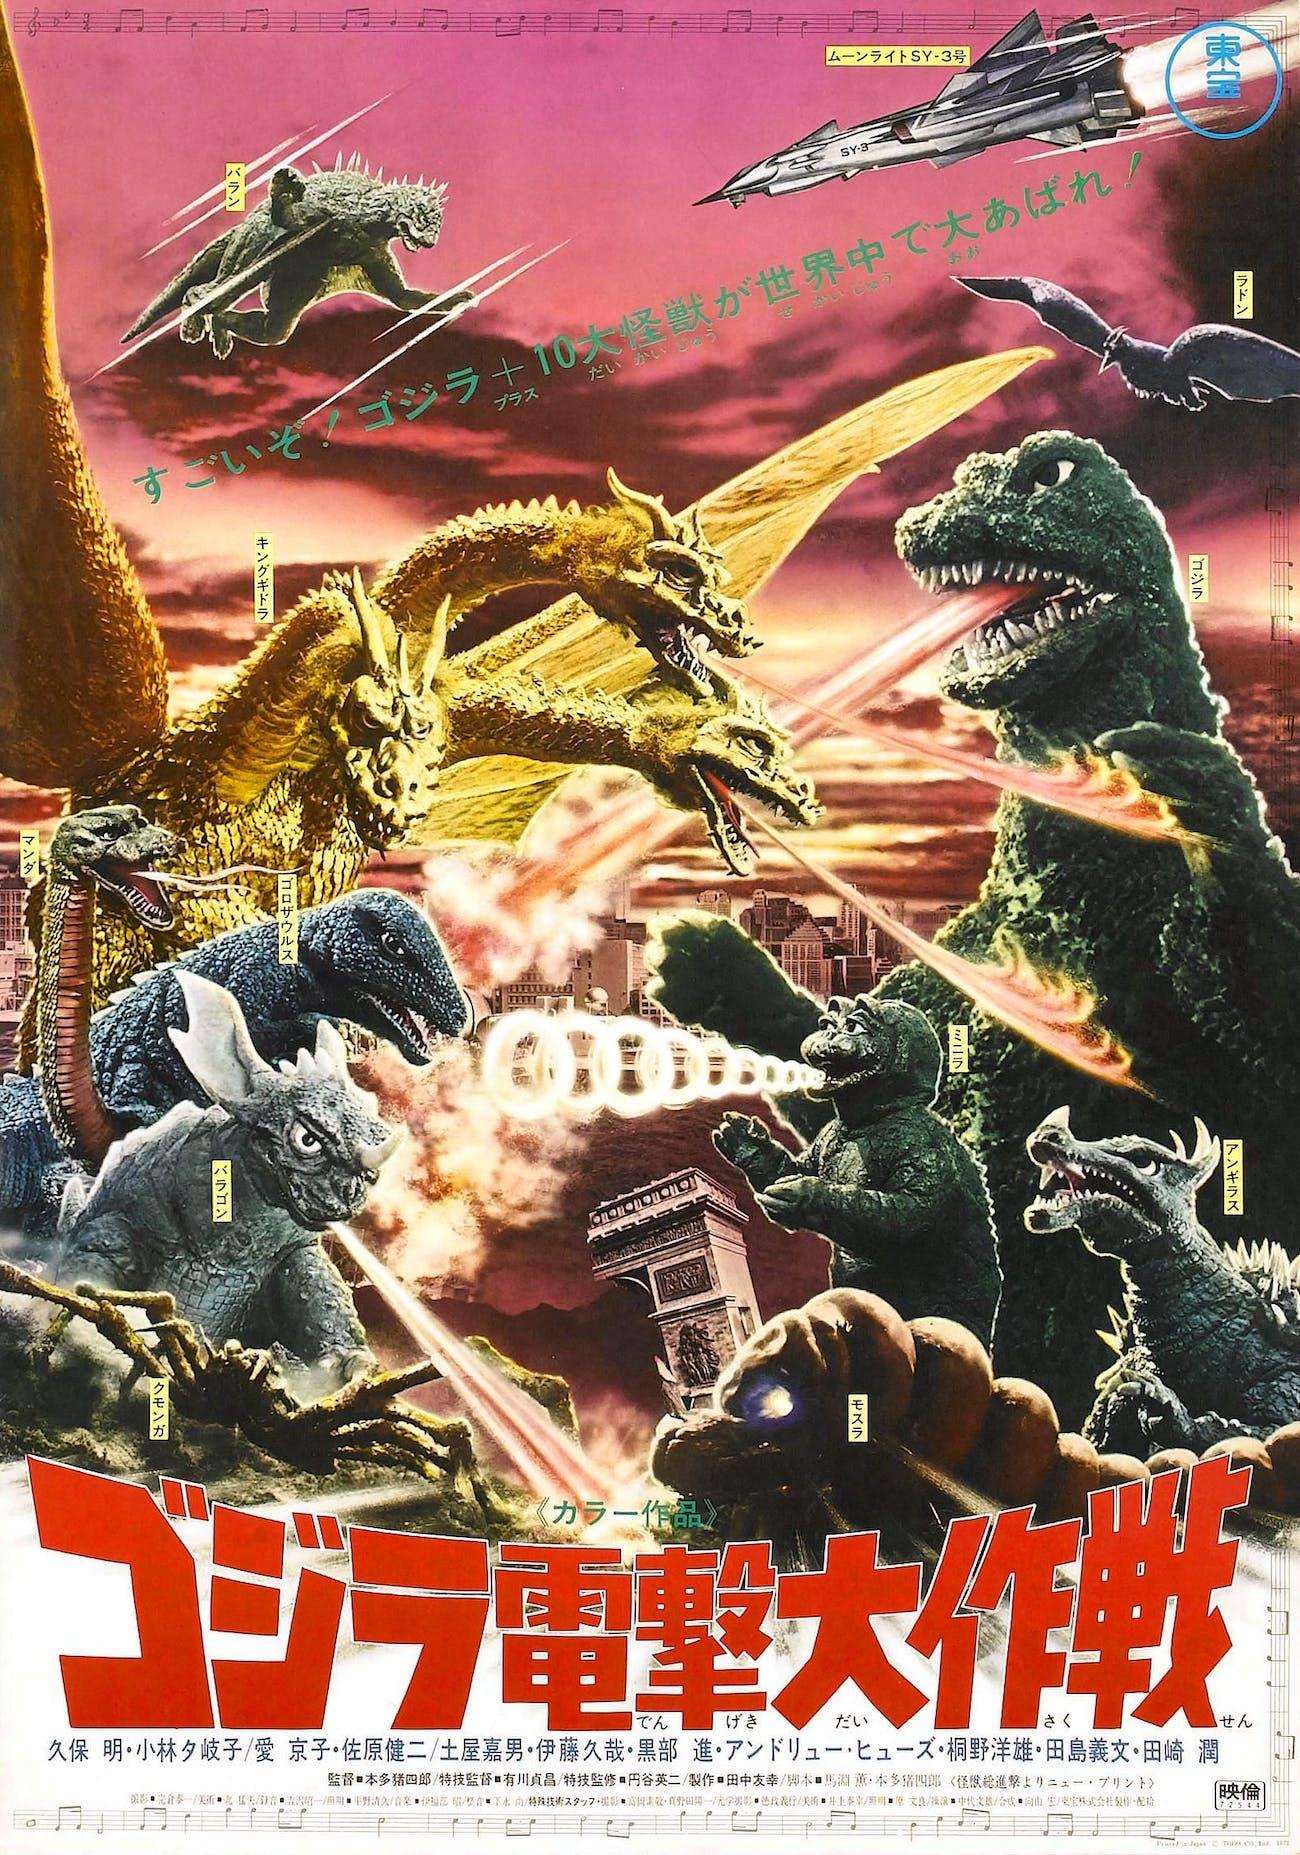 Kong: Skull Island Japan Godzilla Posters Destroy All Monsters